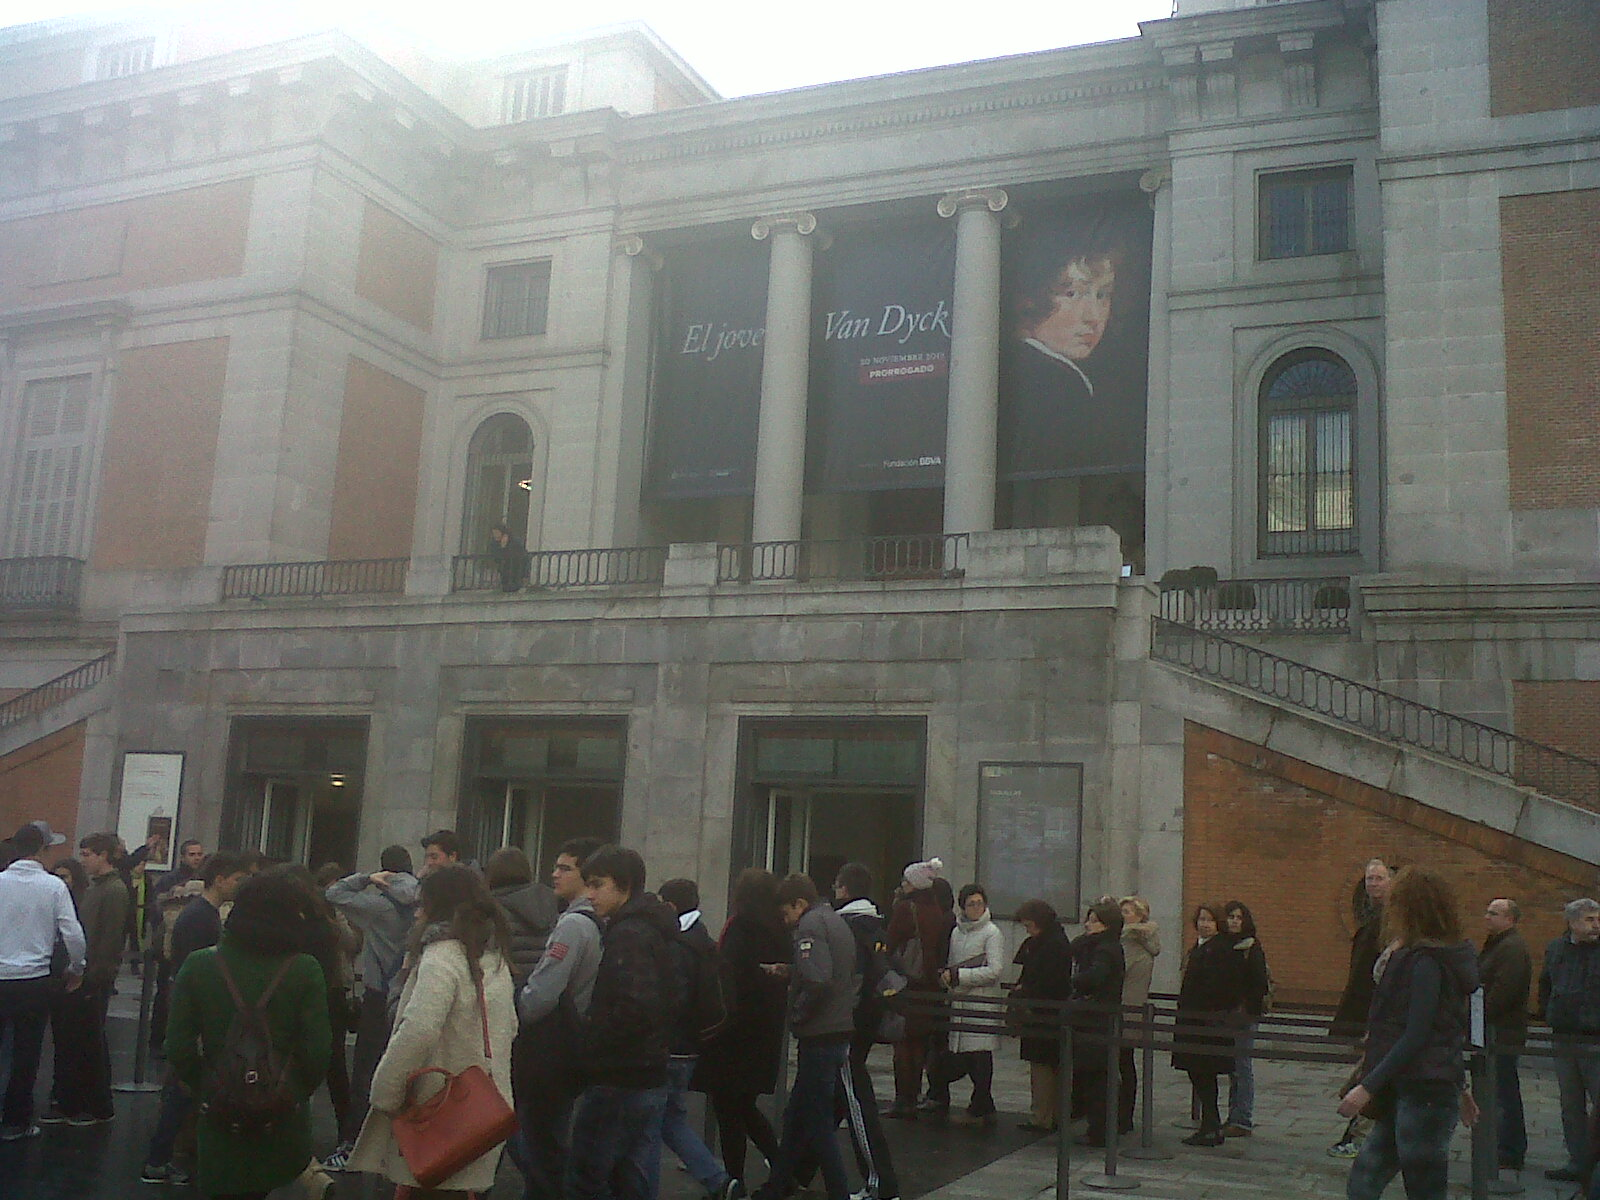 mad-prado-museum-gen-adm-main-ent-feb13